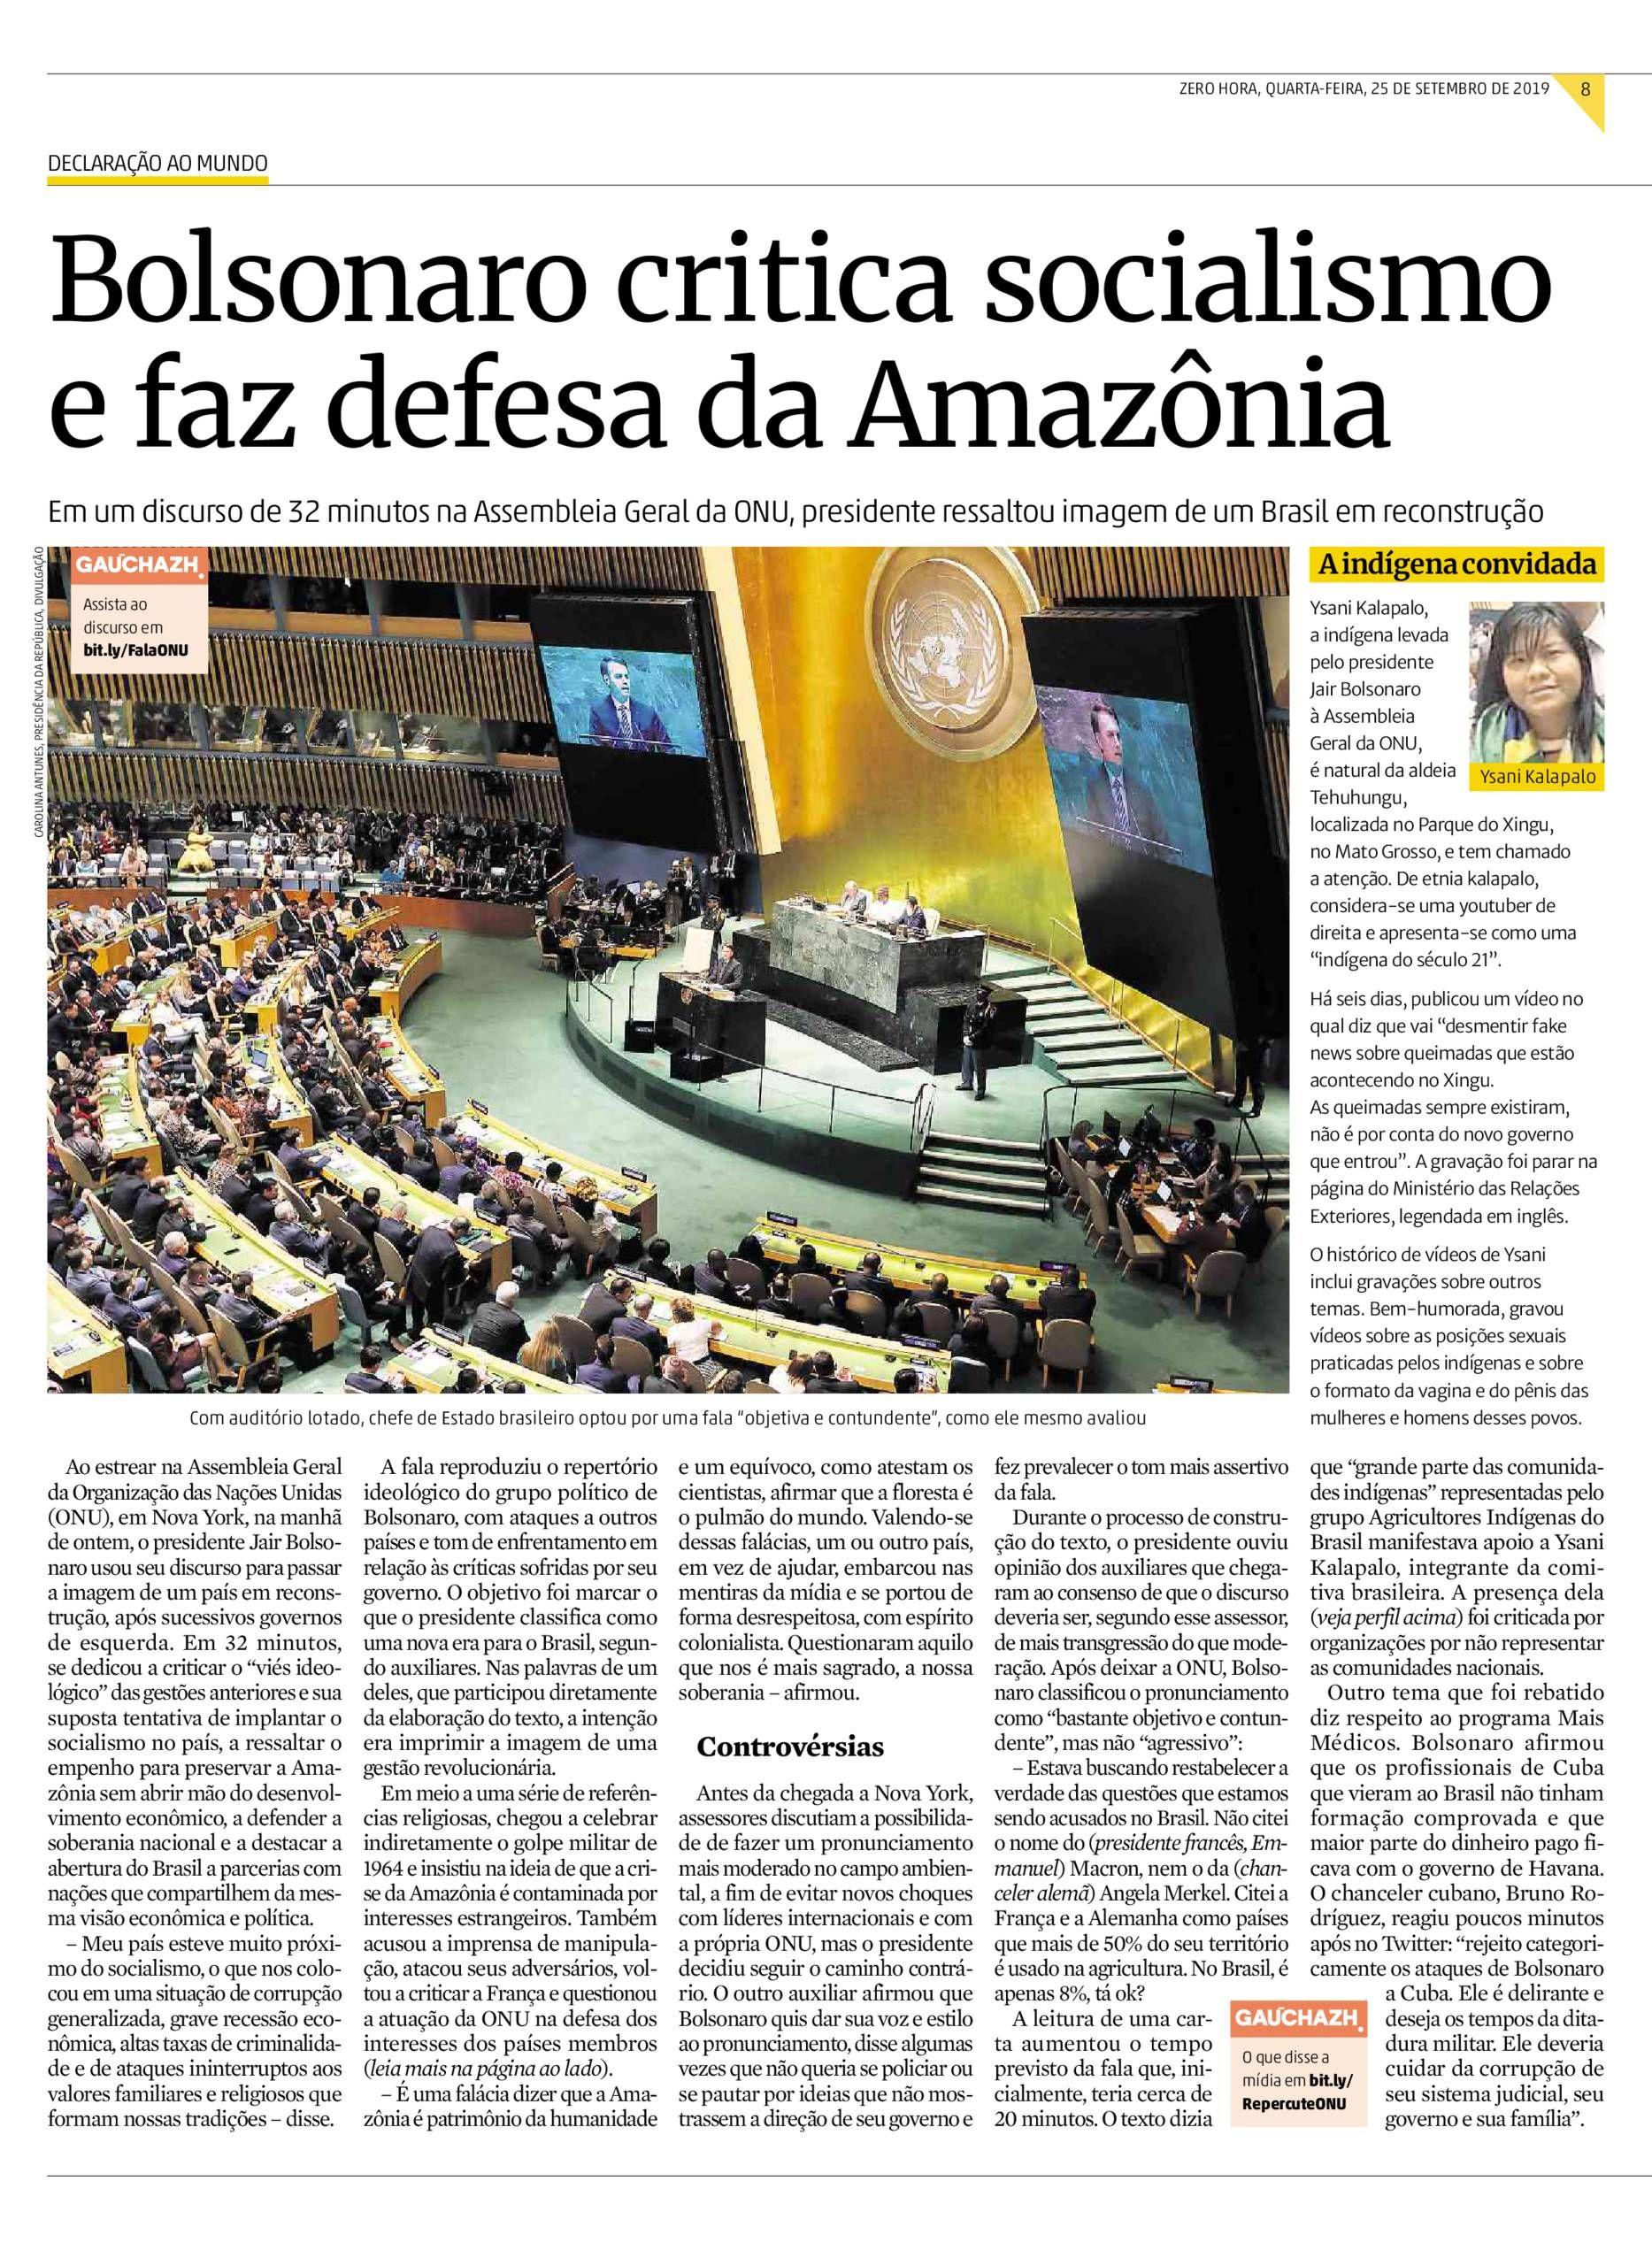 Pin De Manchetes Diarias Em Bolsonaro Na Onu Socialismo E Brasil